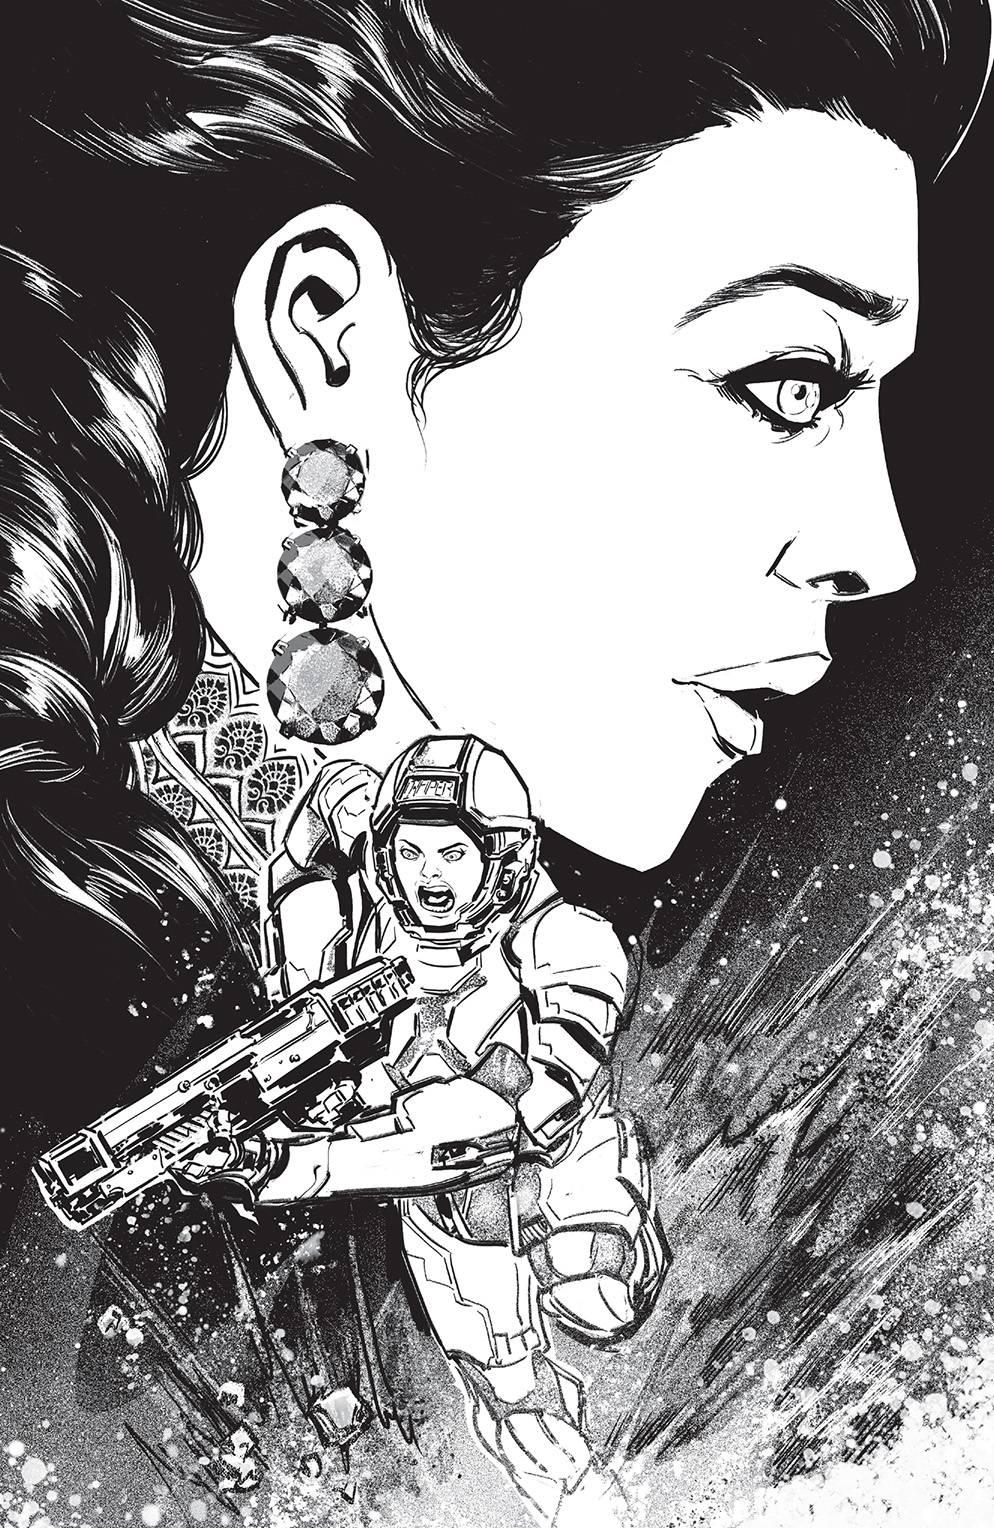 STL177277 ComicList: BOOM! Studios New Releases for 02/17/2021